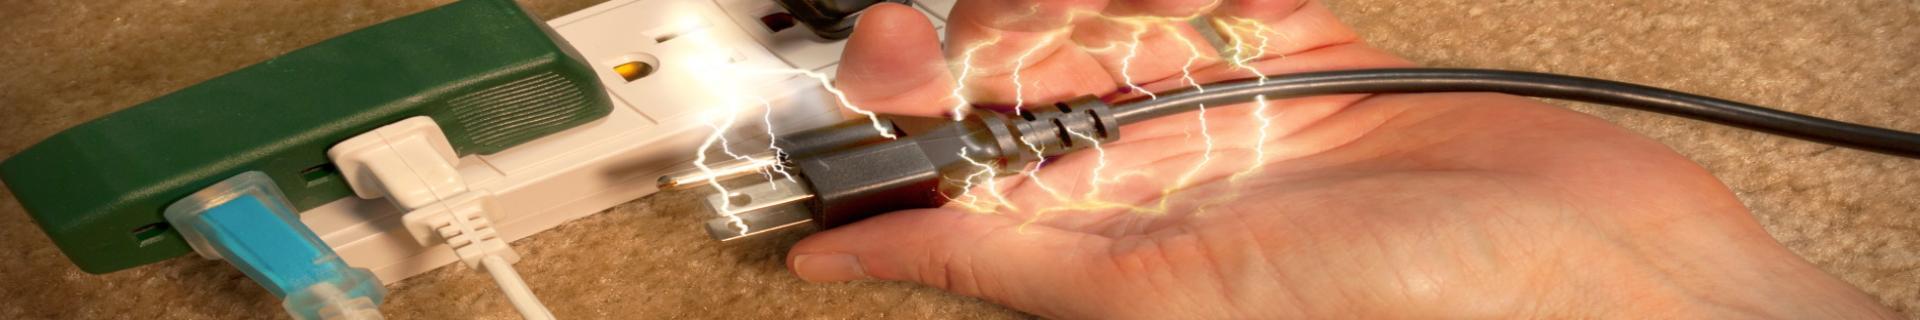 Electrocution Hazards in Construction